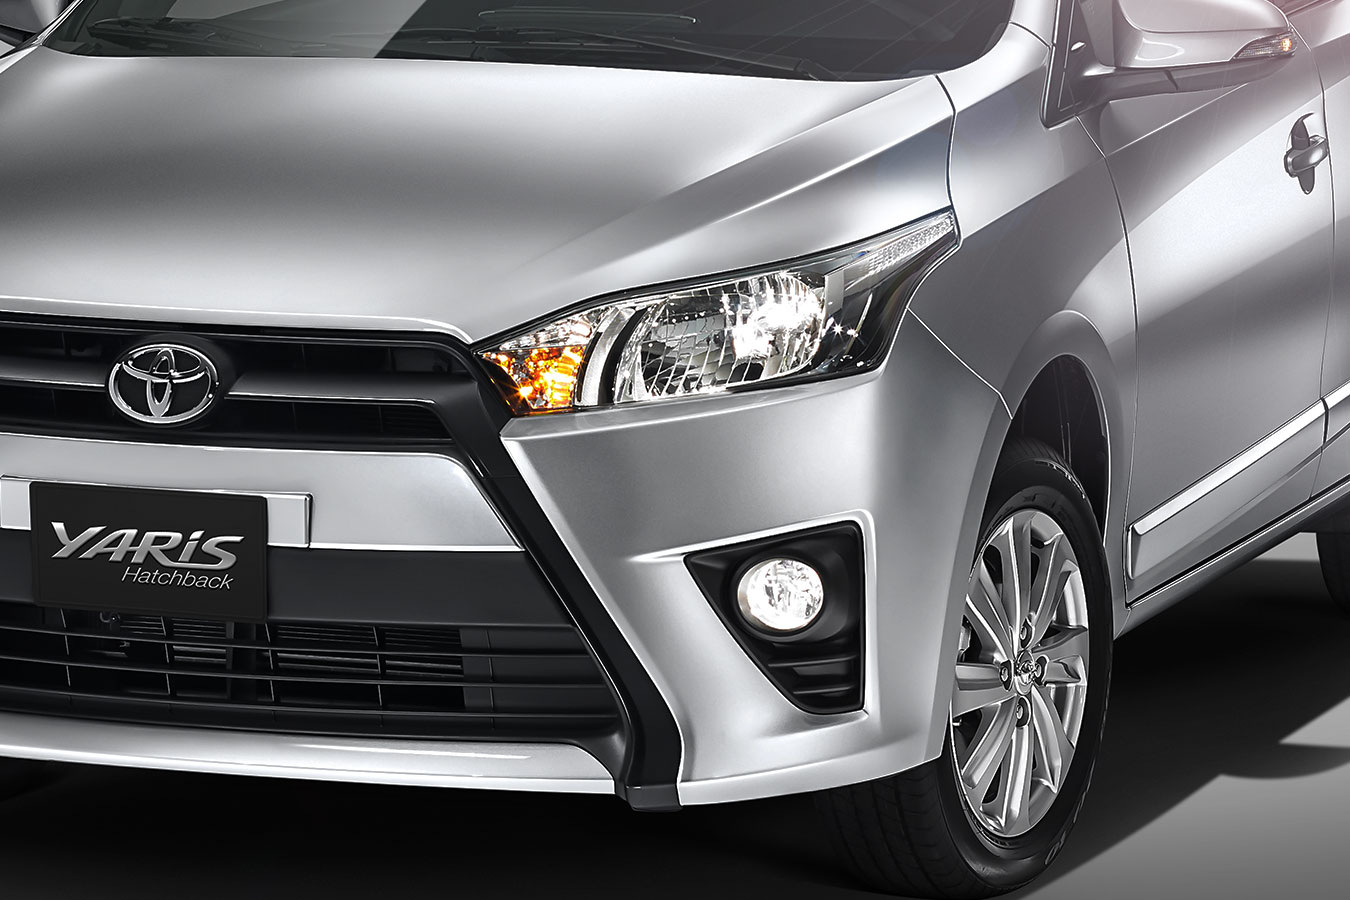 Toyota Yaris Hatchback 2017 en México faros